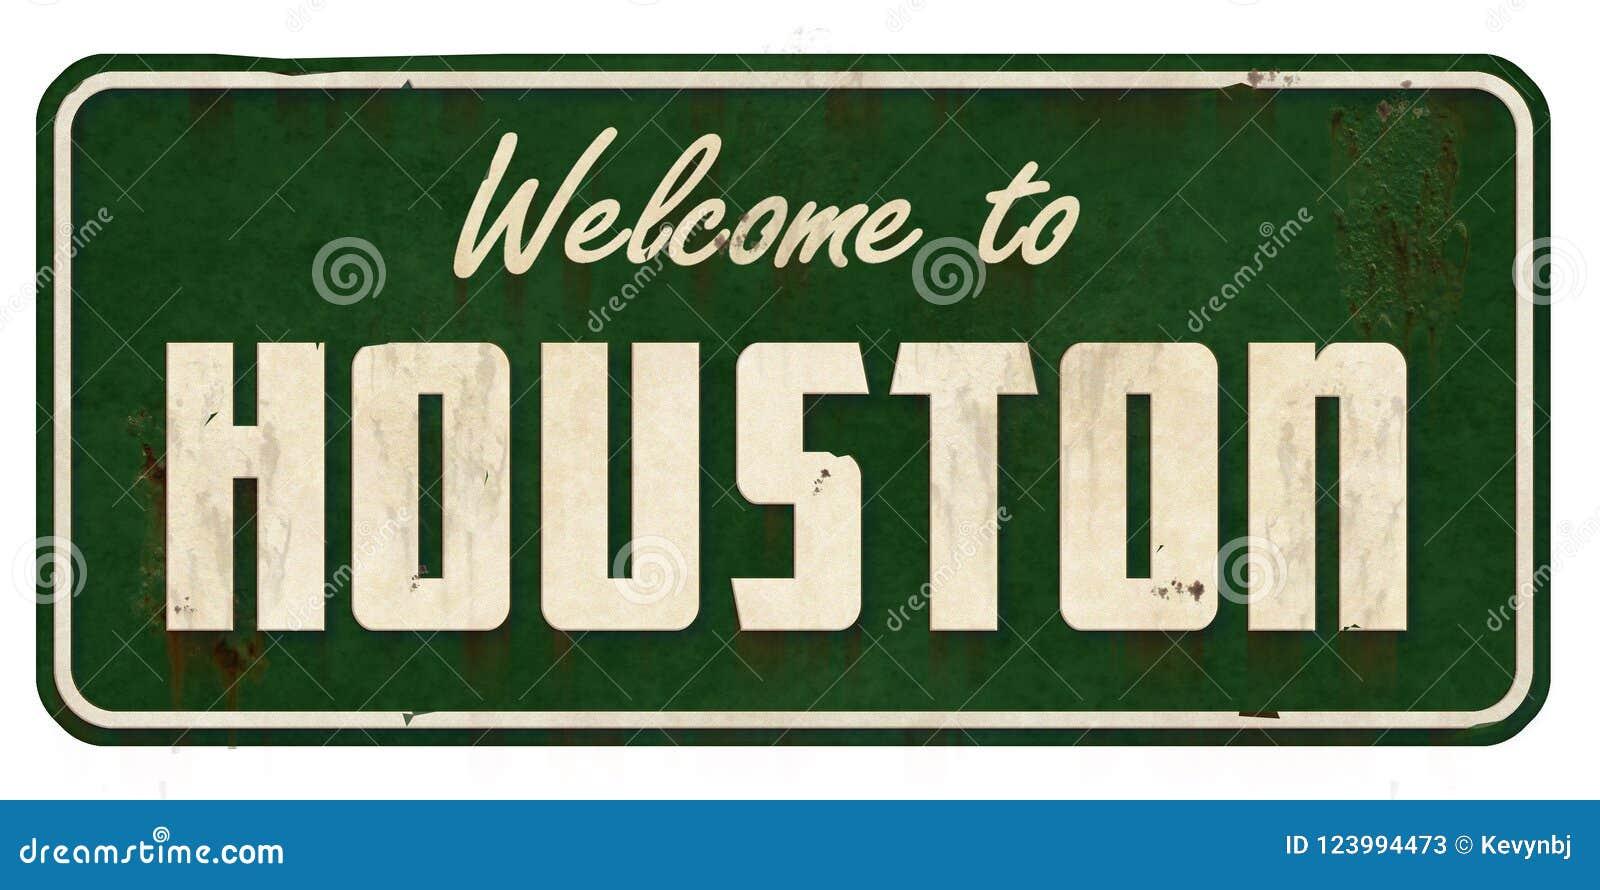 Houston Texas Road Sign Grunge